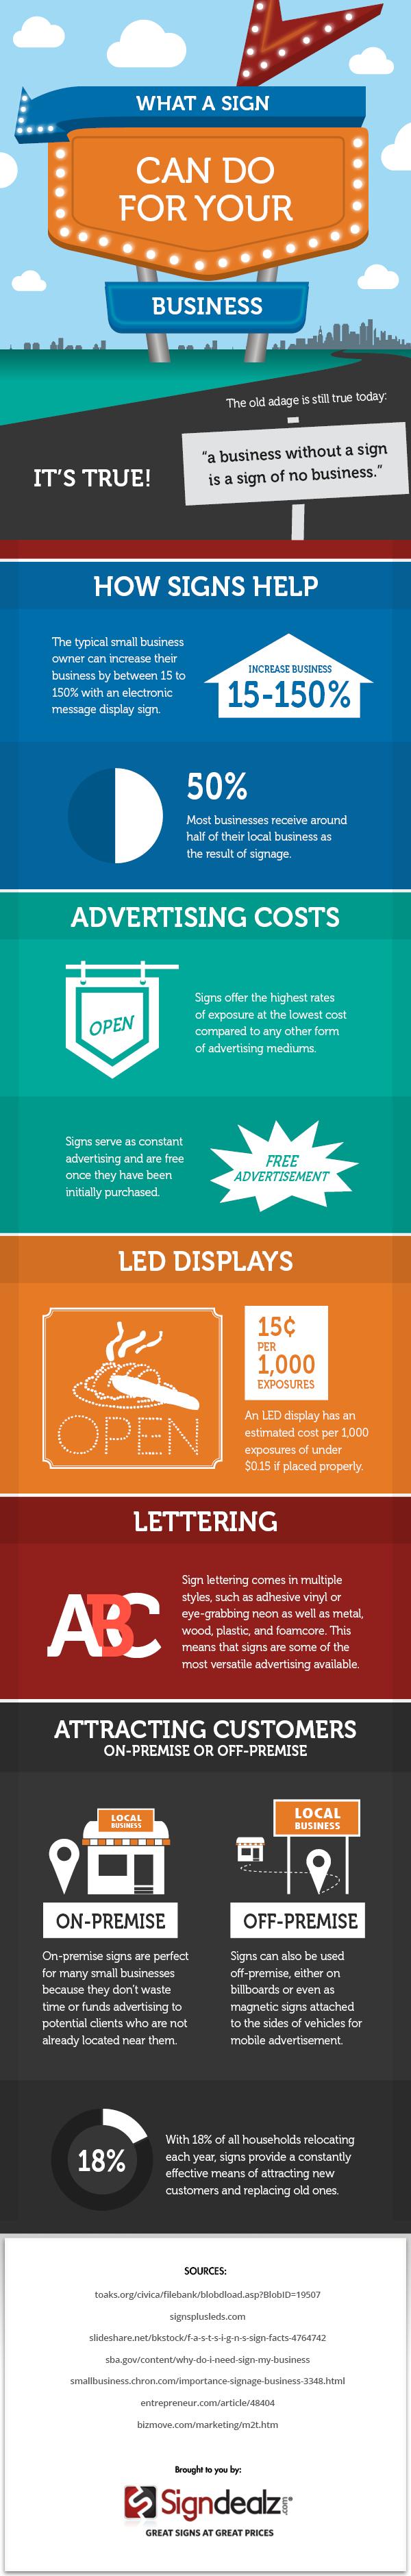 business signs infographic information denver